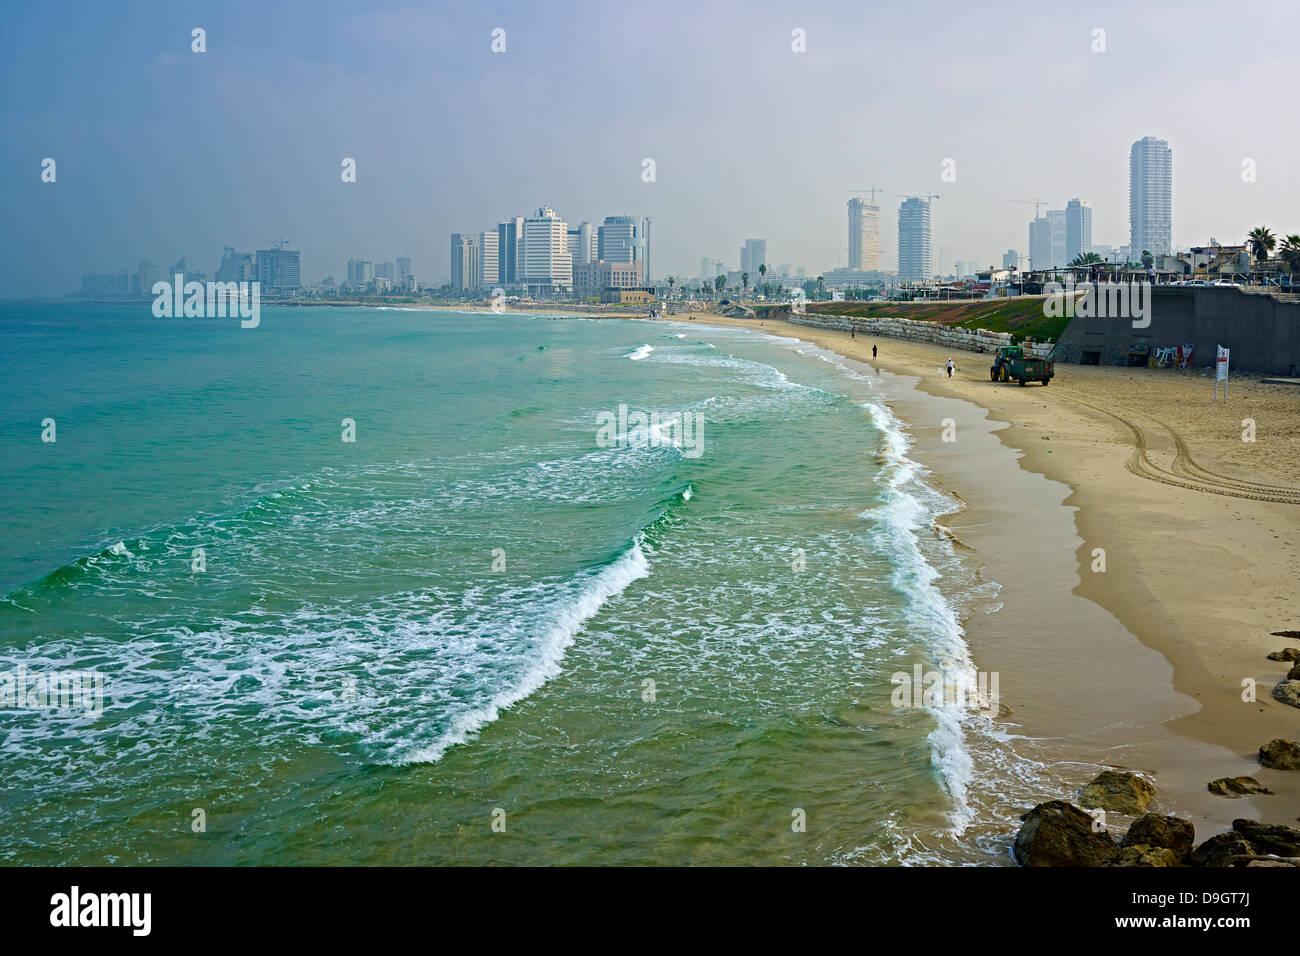 Vista desde Jaffa al skyline de Tel Aviv, Israel Imagen De Stock